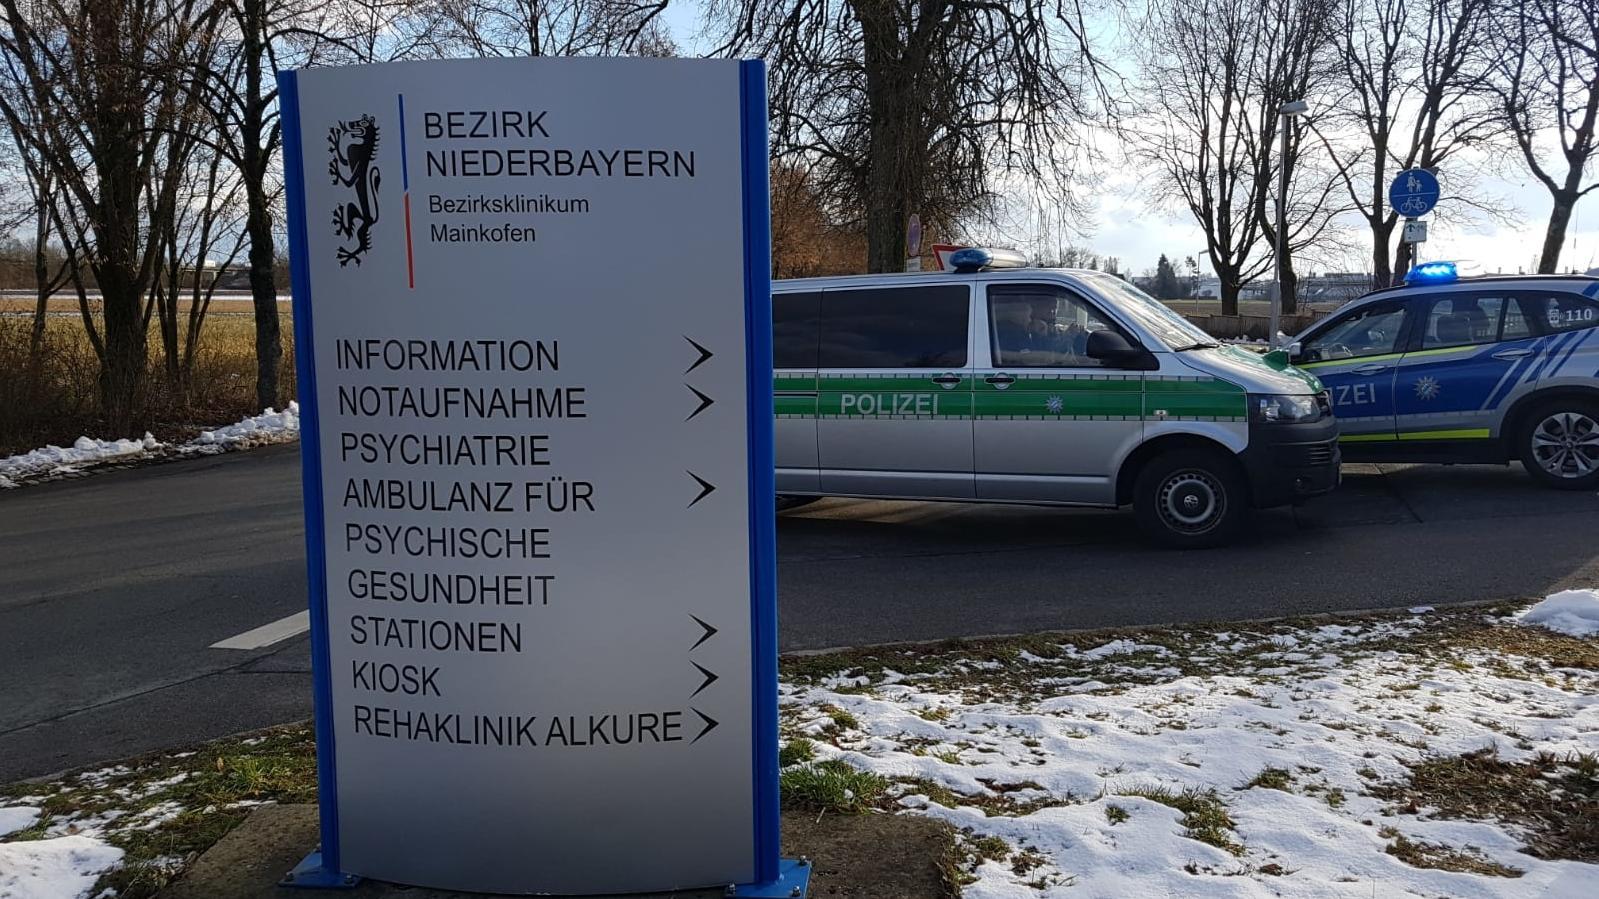 Polizeieinsatz am Bezirksklinikum Mainkofen.